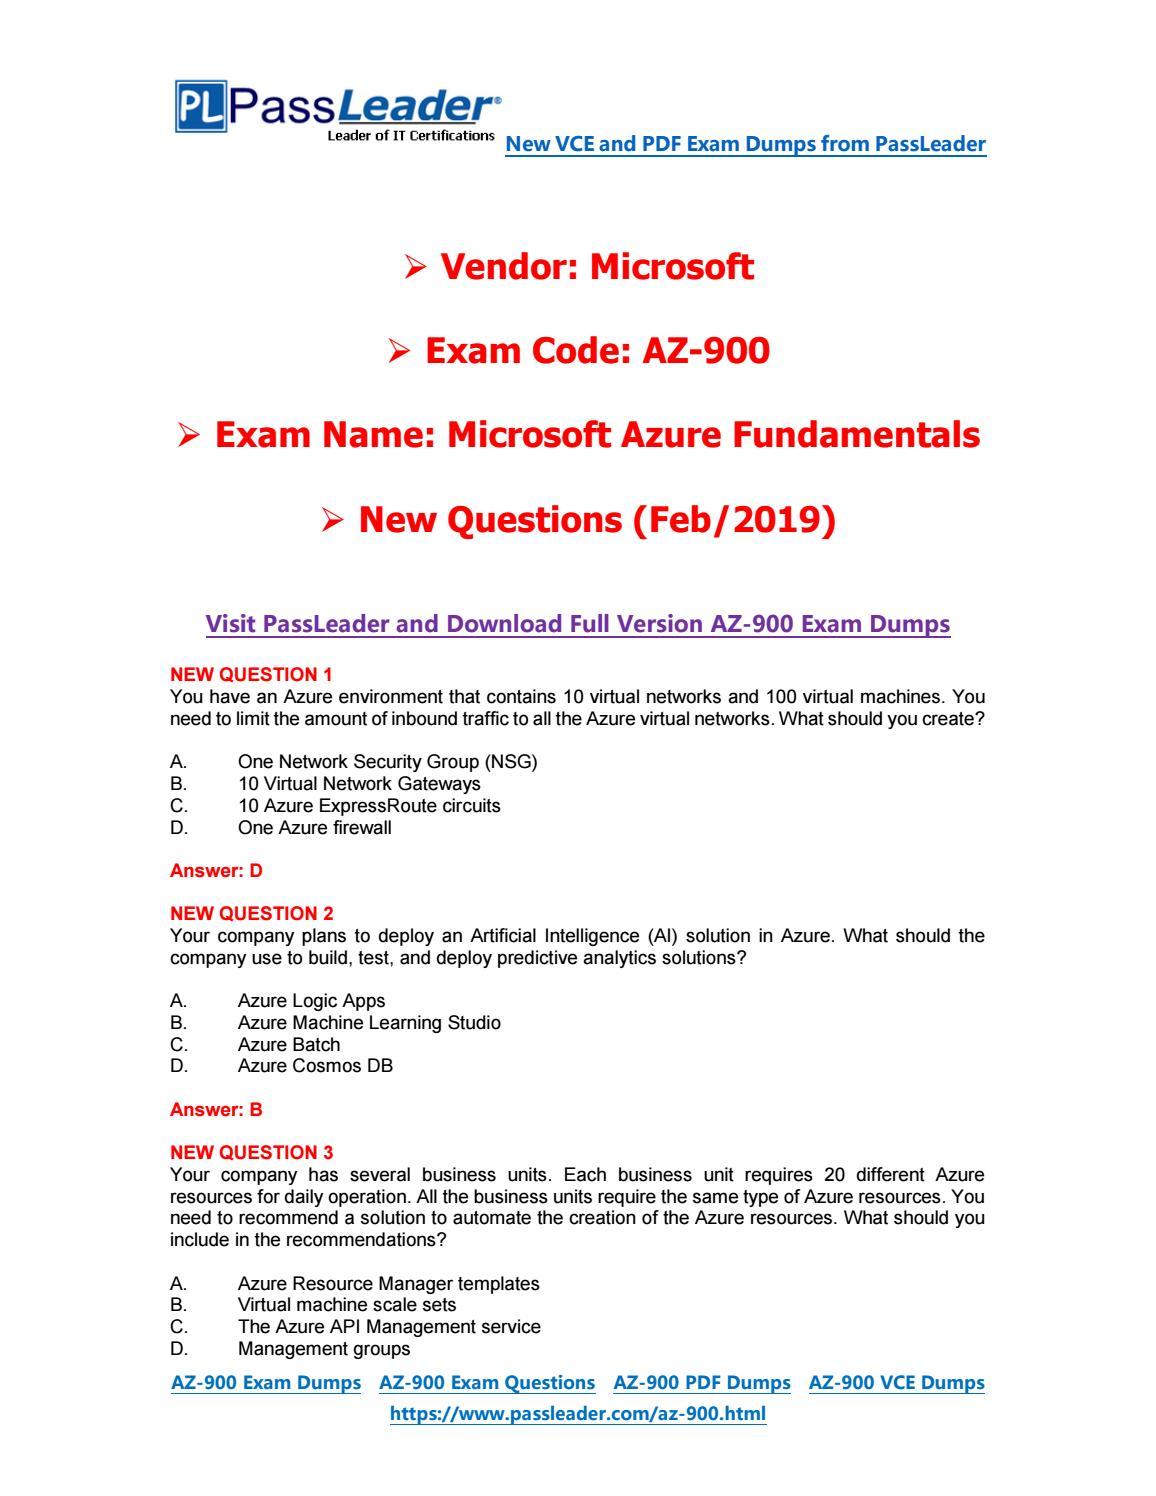 az 900 exam dumps pdf free